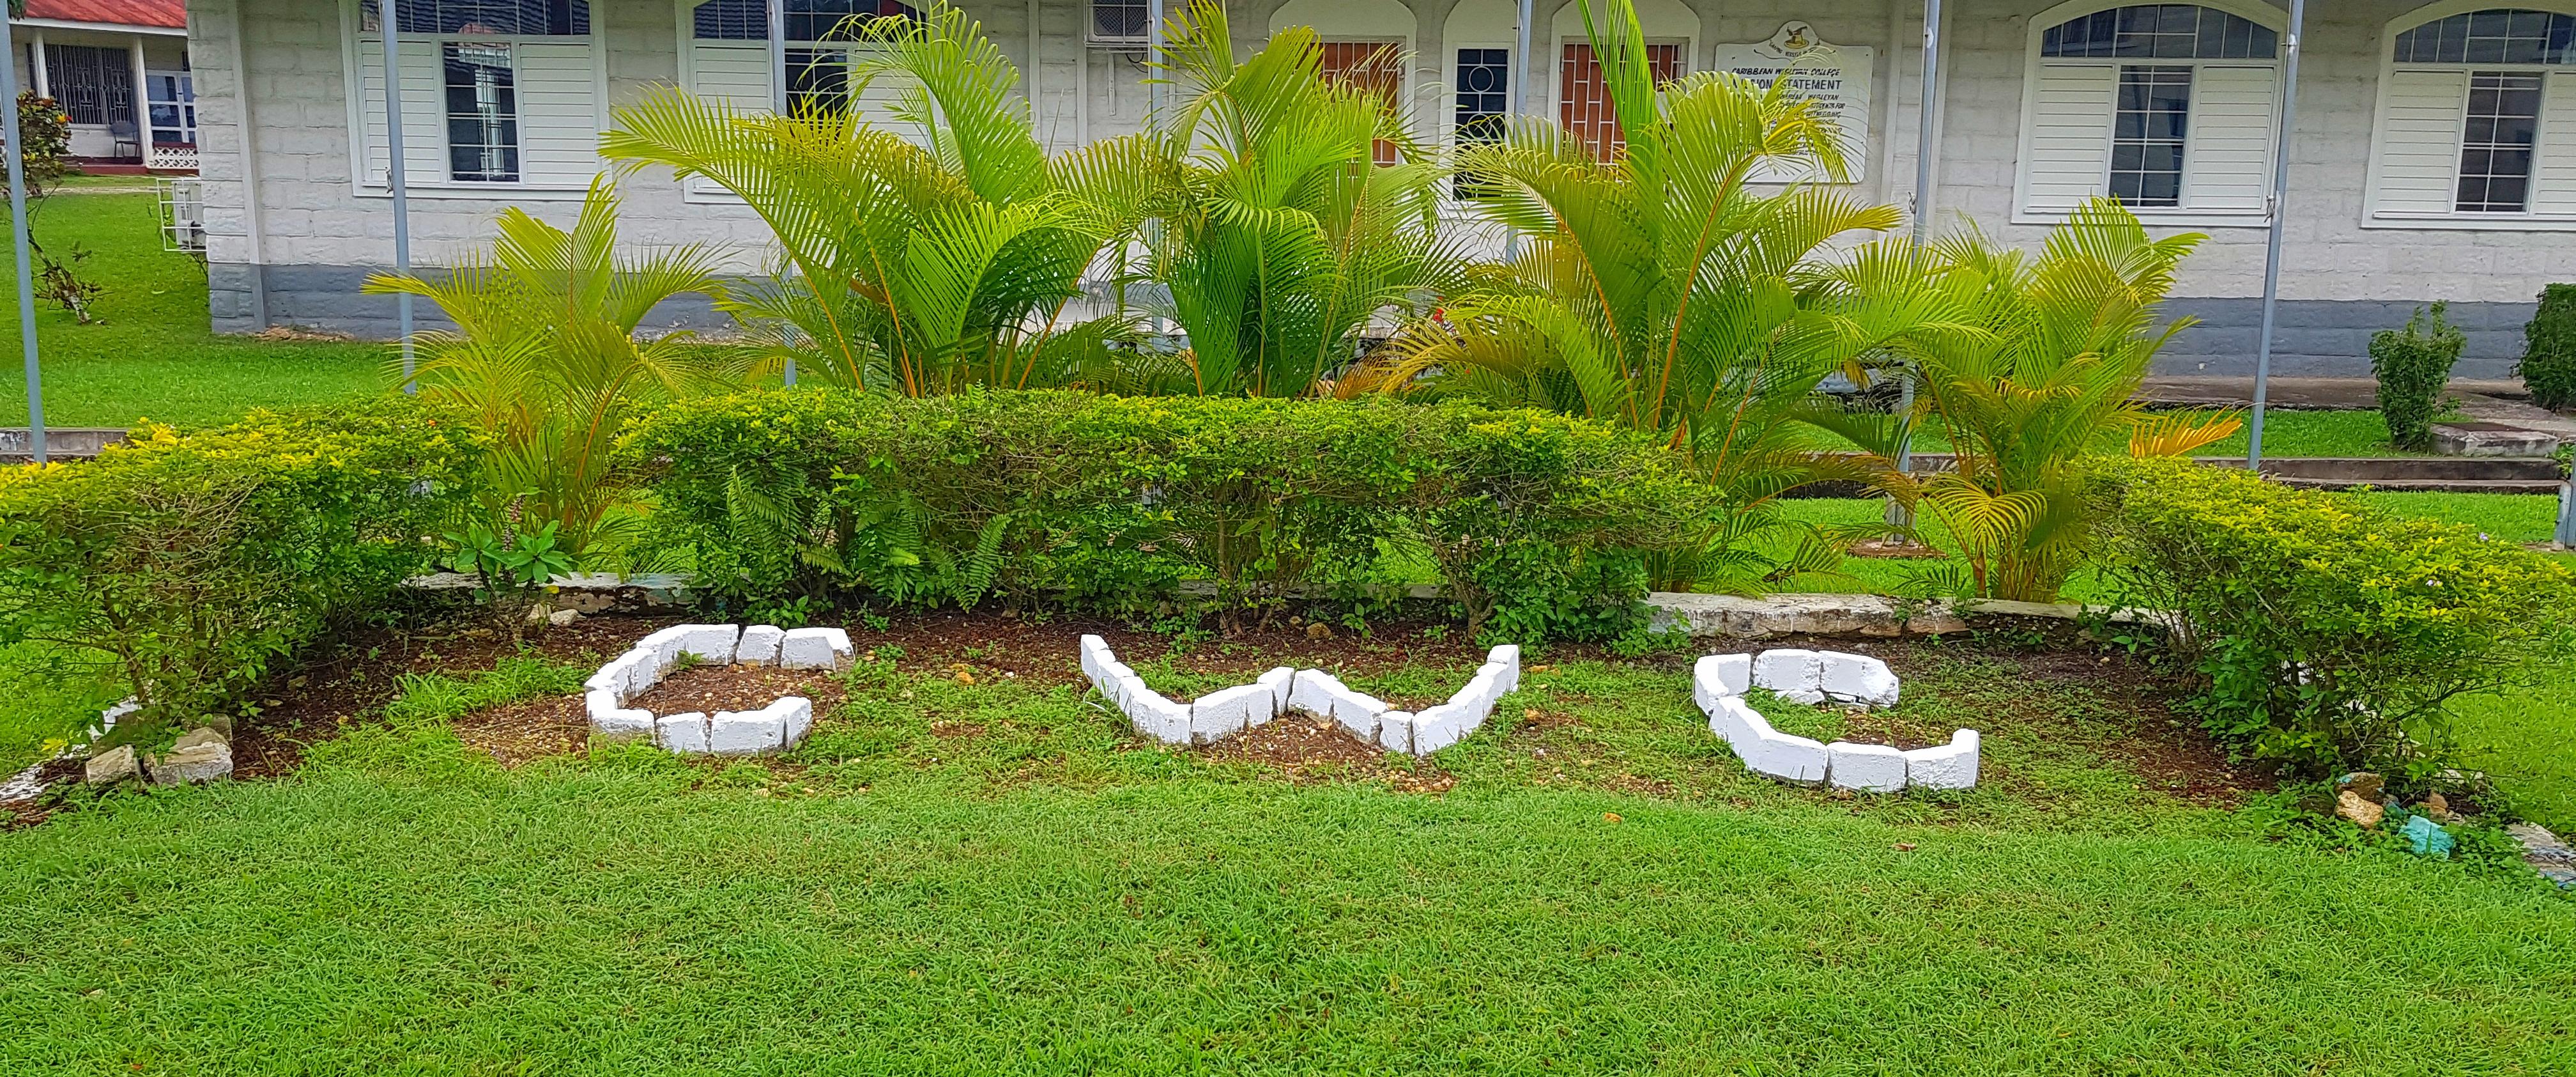 Caribbean Wesleyan College Campus